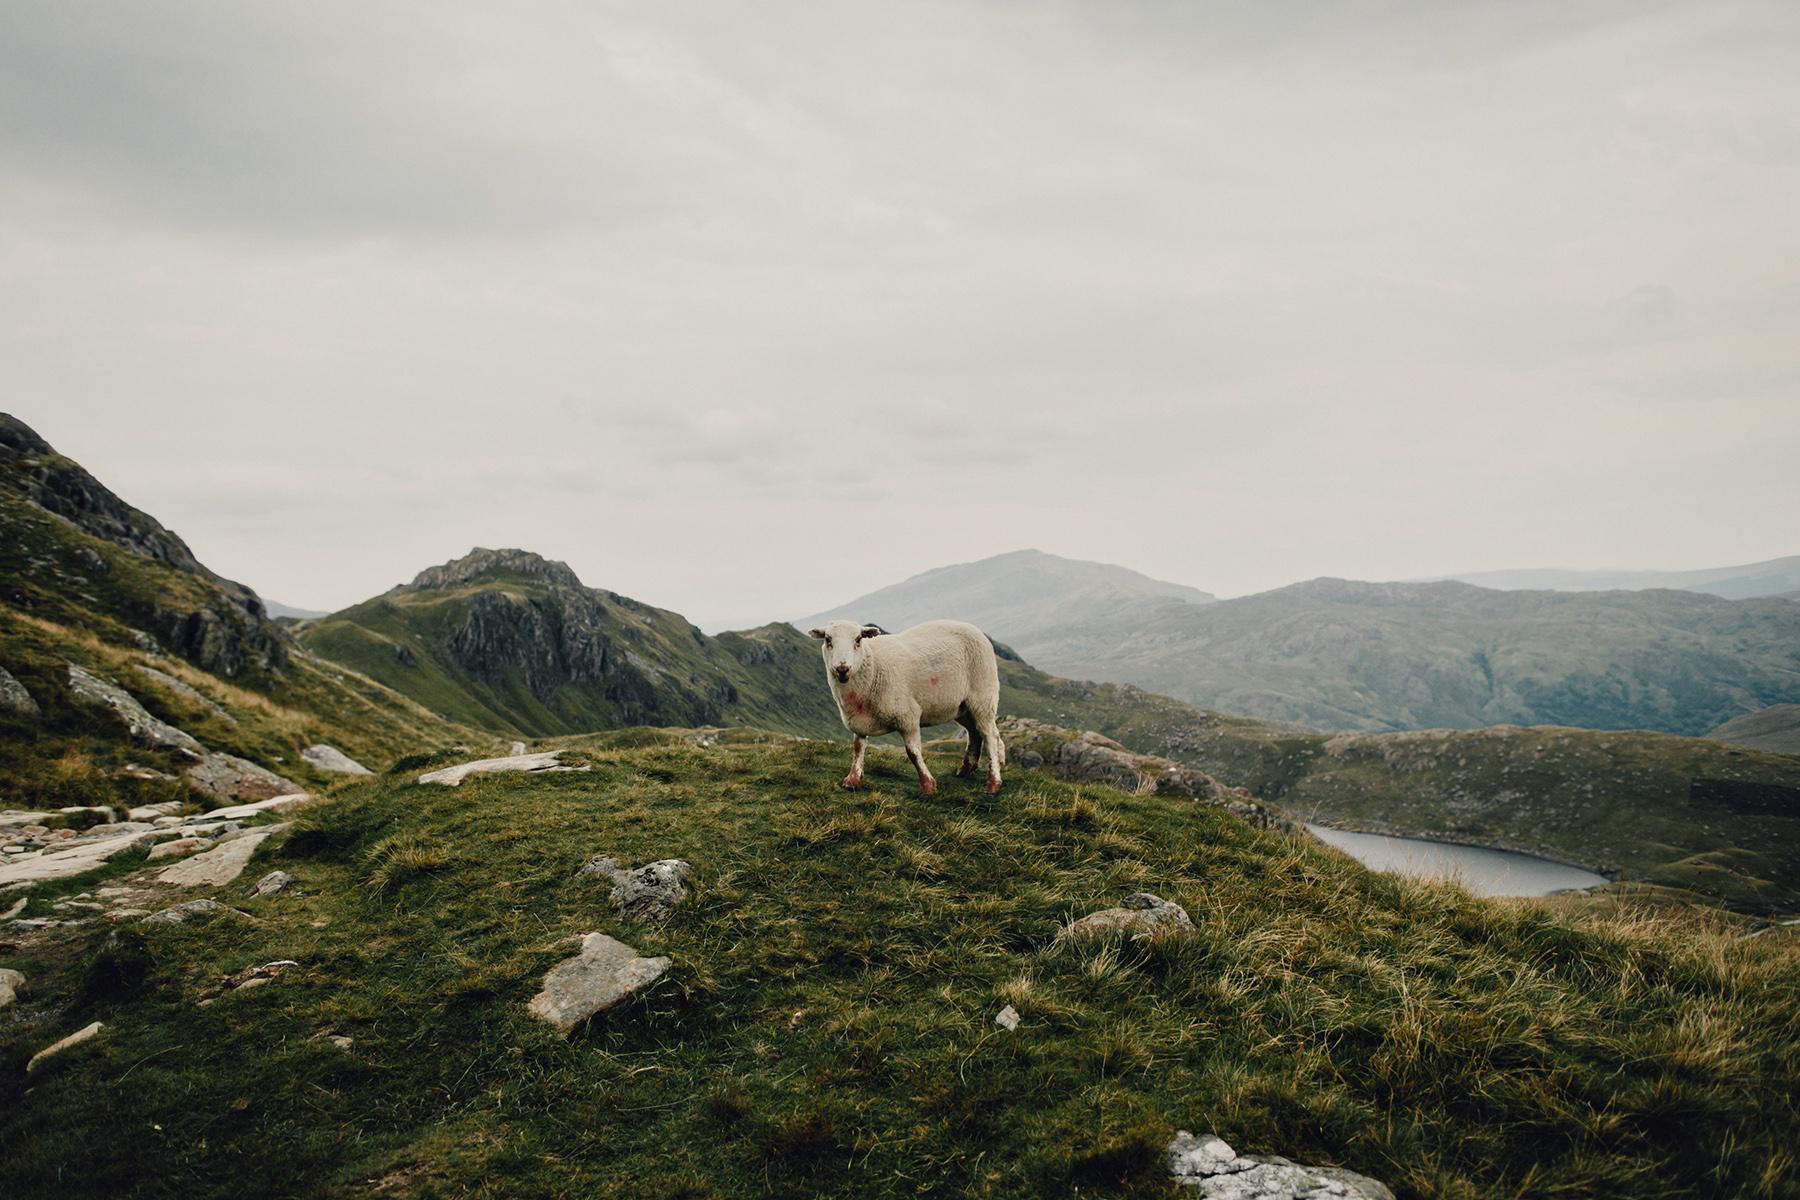 Mt-Snowdon-Hike-Photos-From-Peny-Pass-00201.jpg